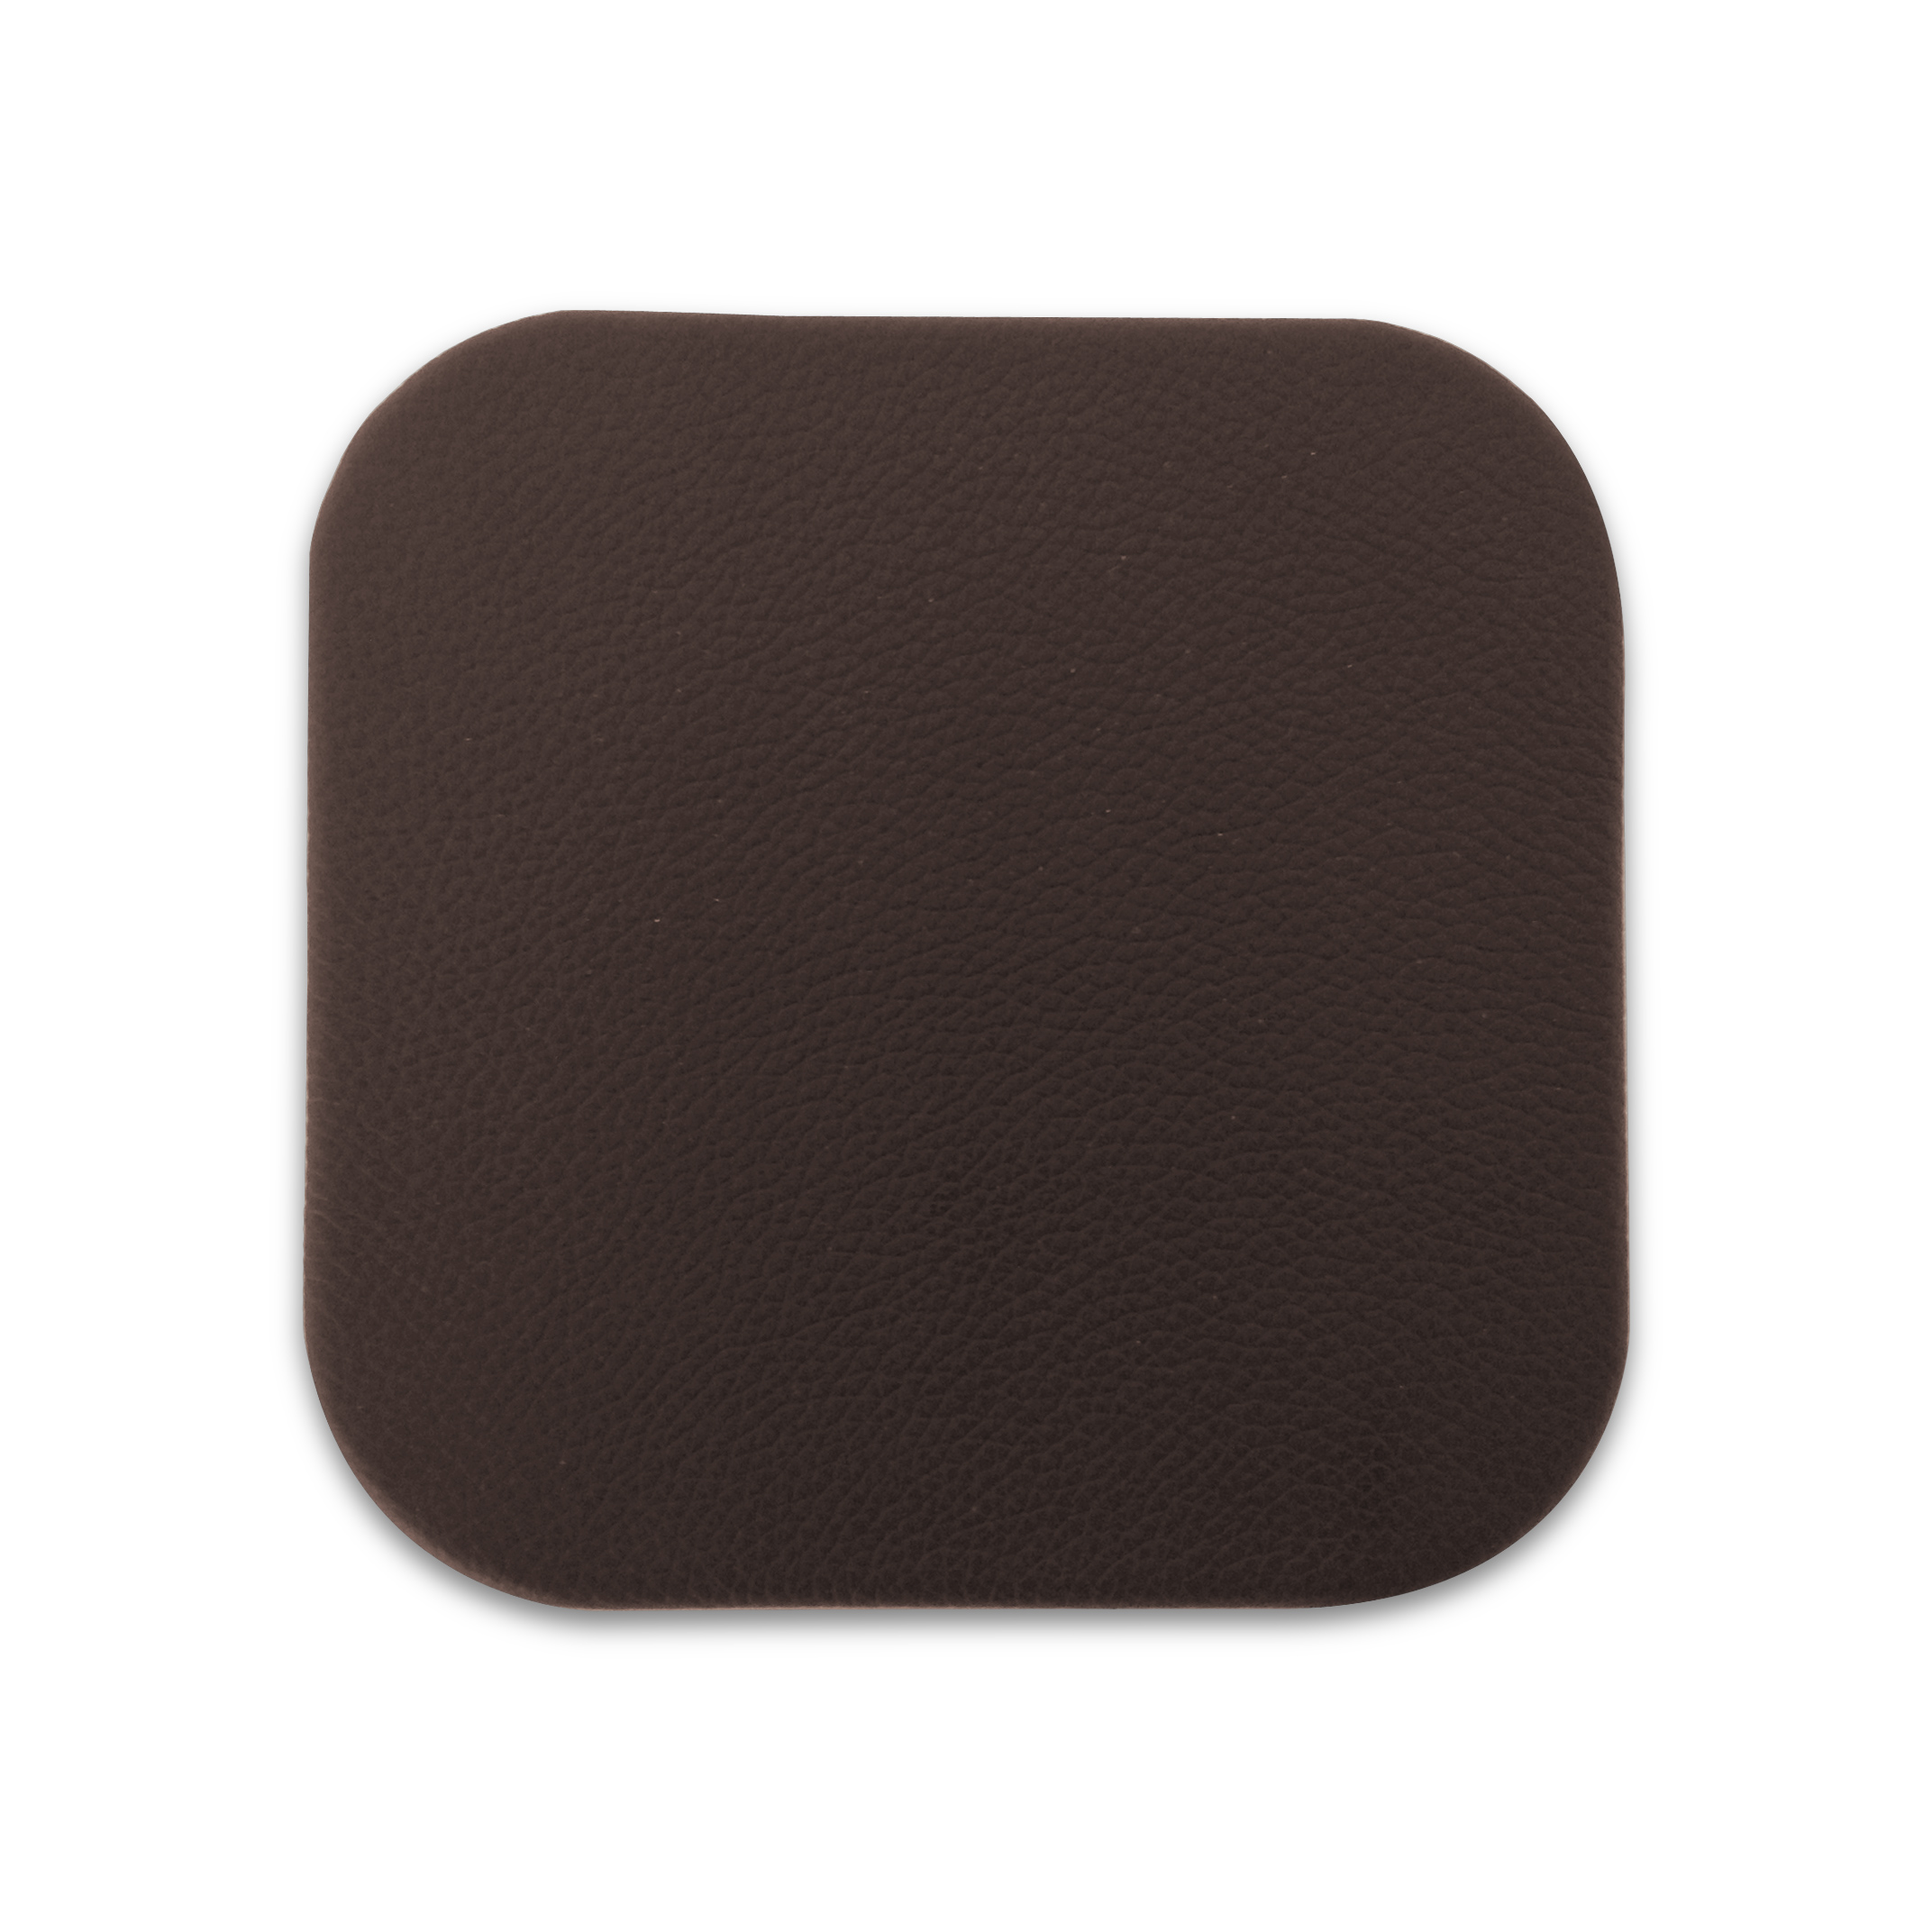 Dark Brown Leather Drink Coasters Sets Individual